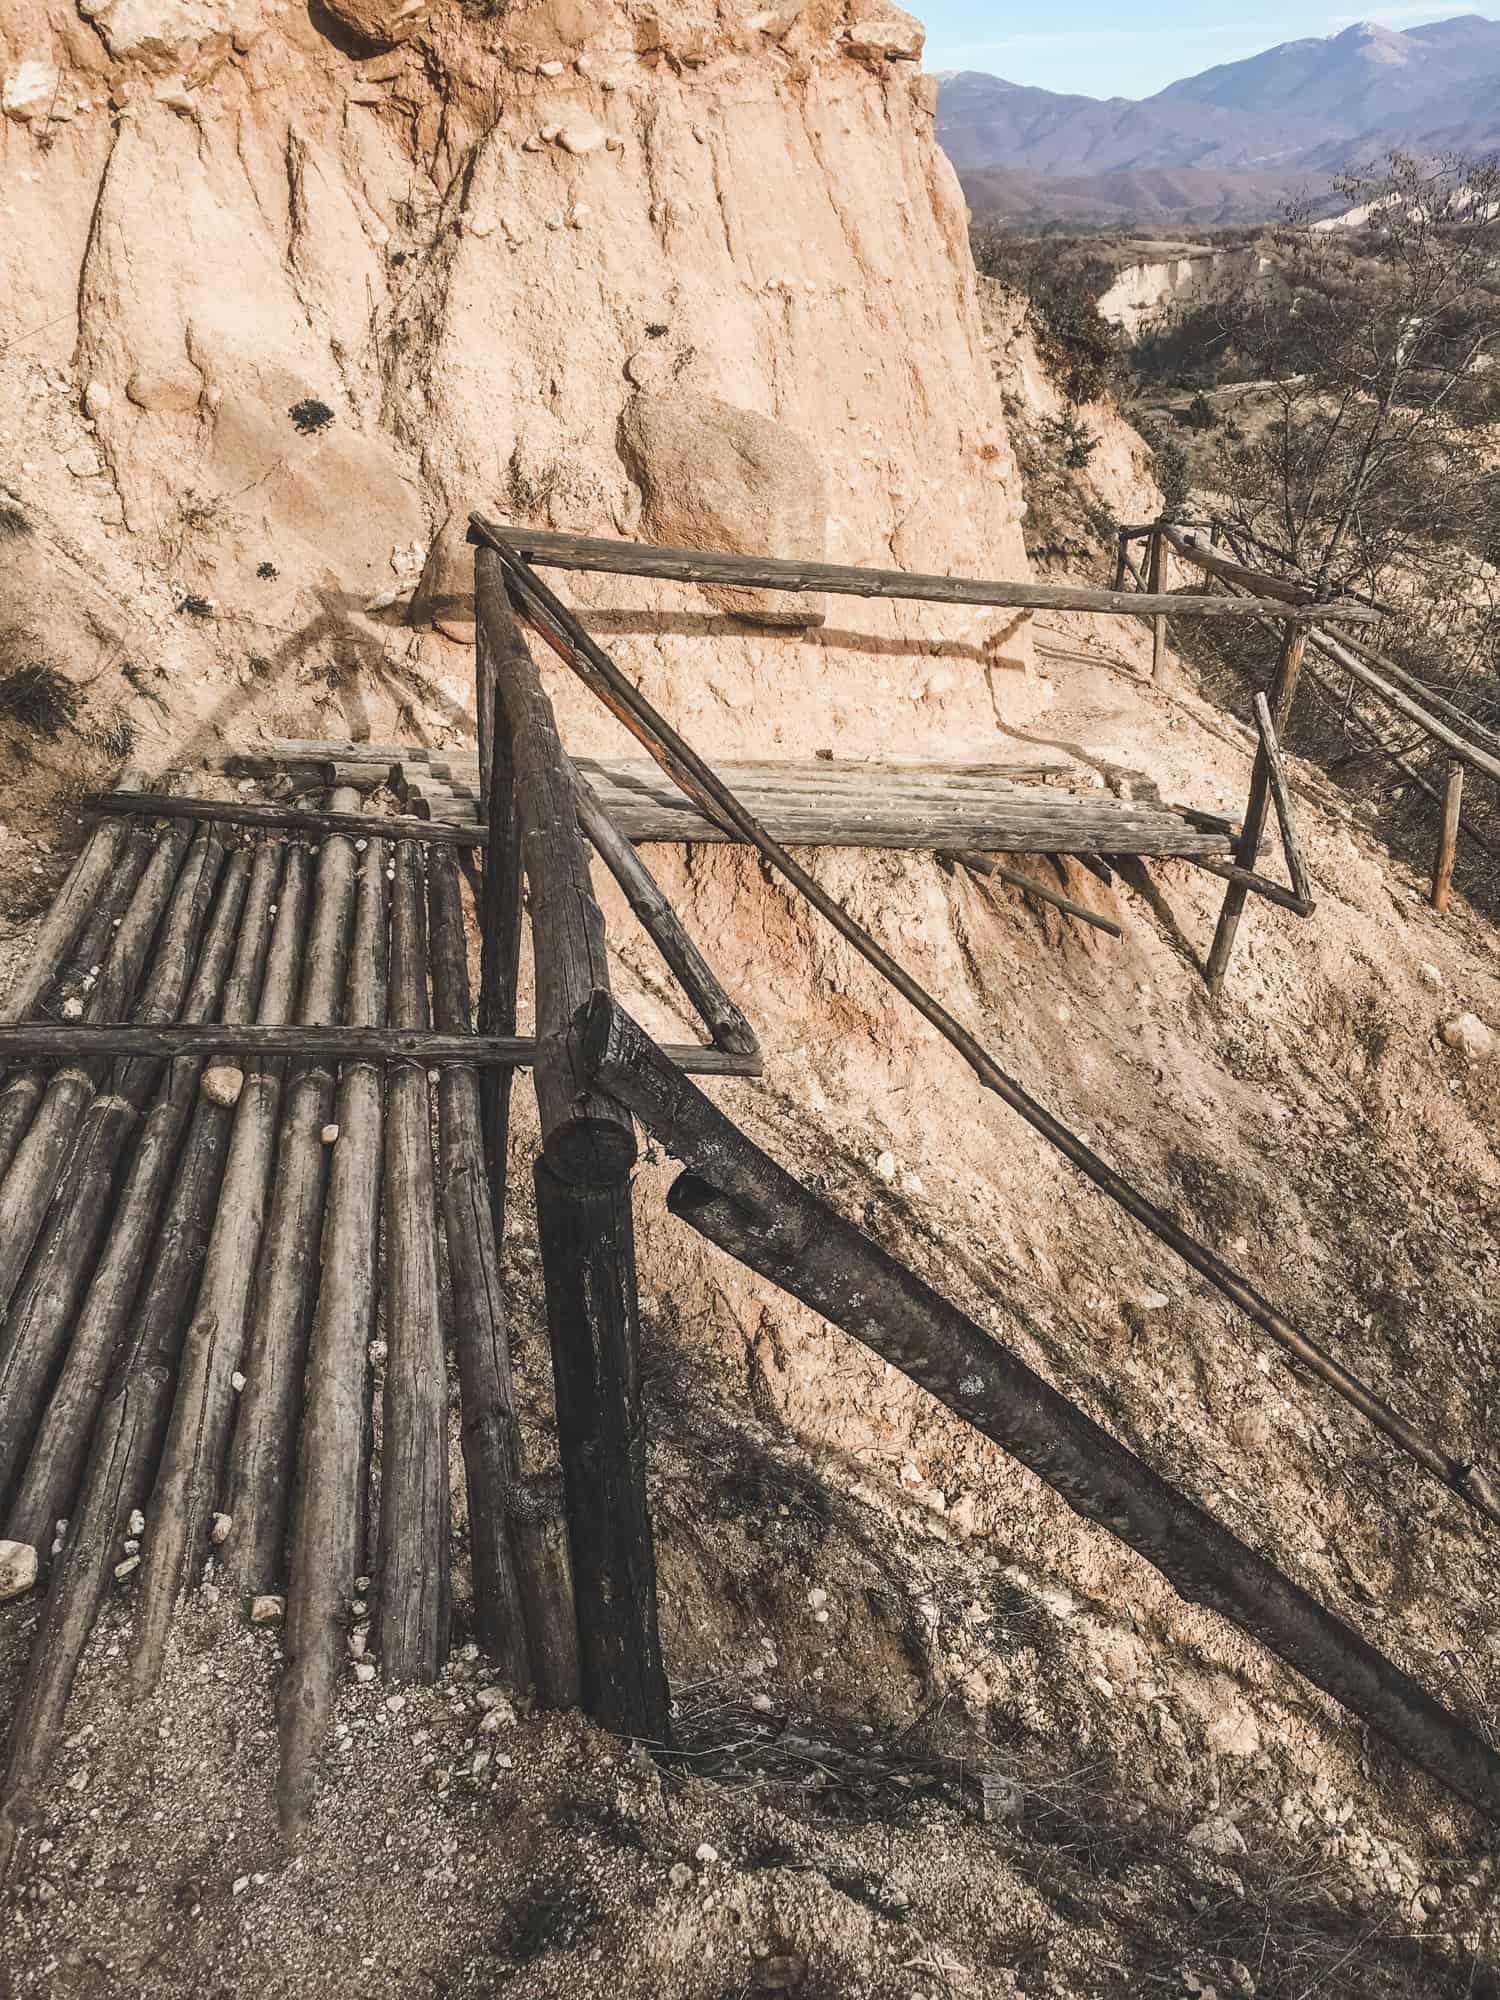 Trail from Melnik to the Rozhen Monastery in Melnik, Bulgaria